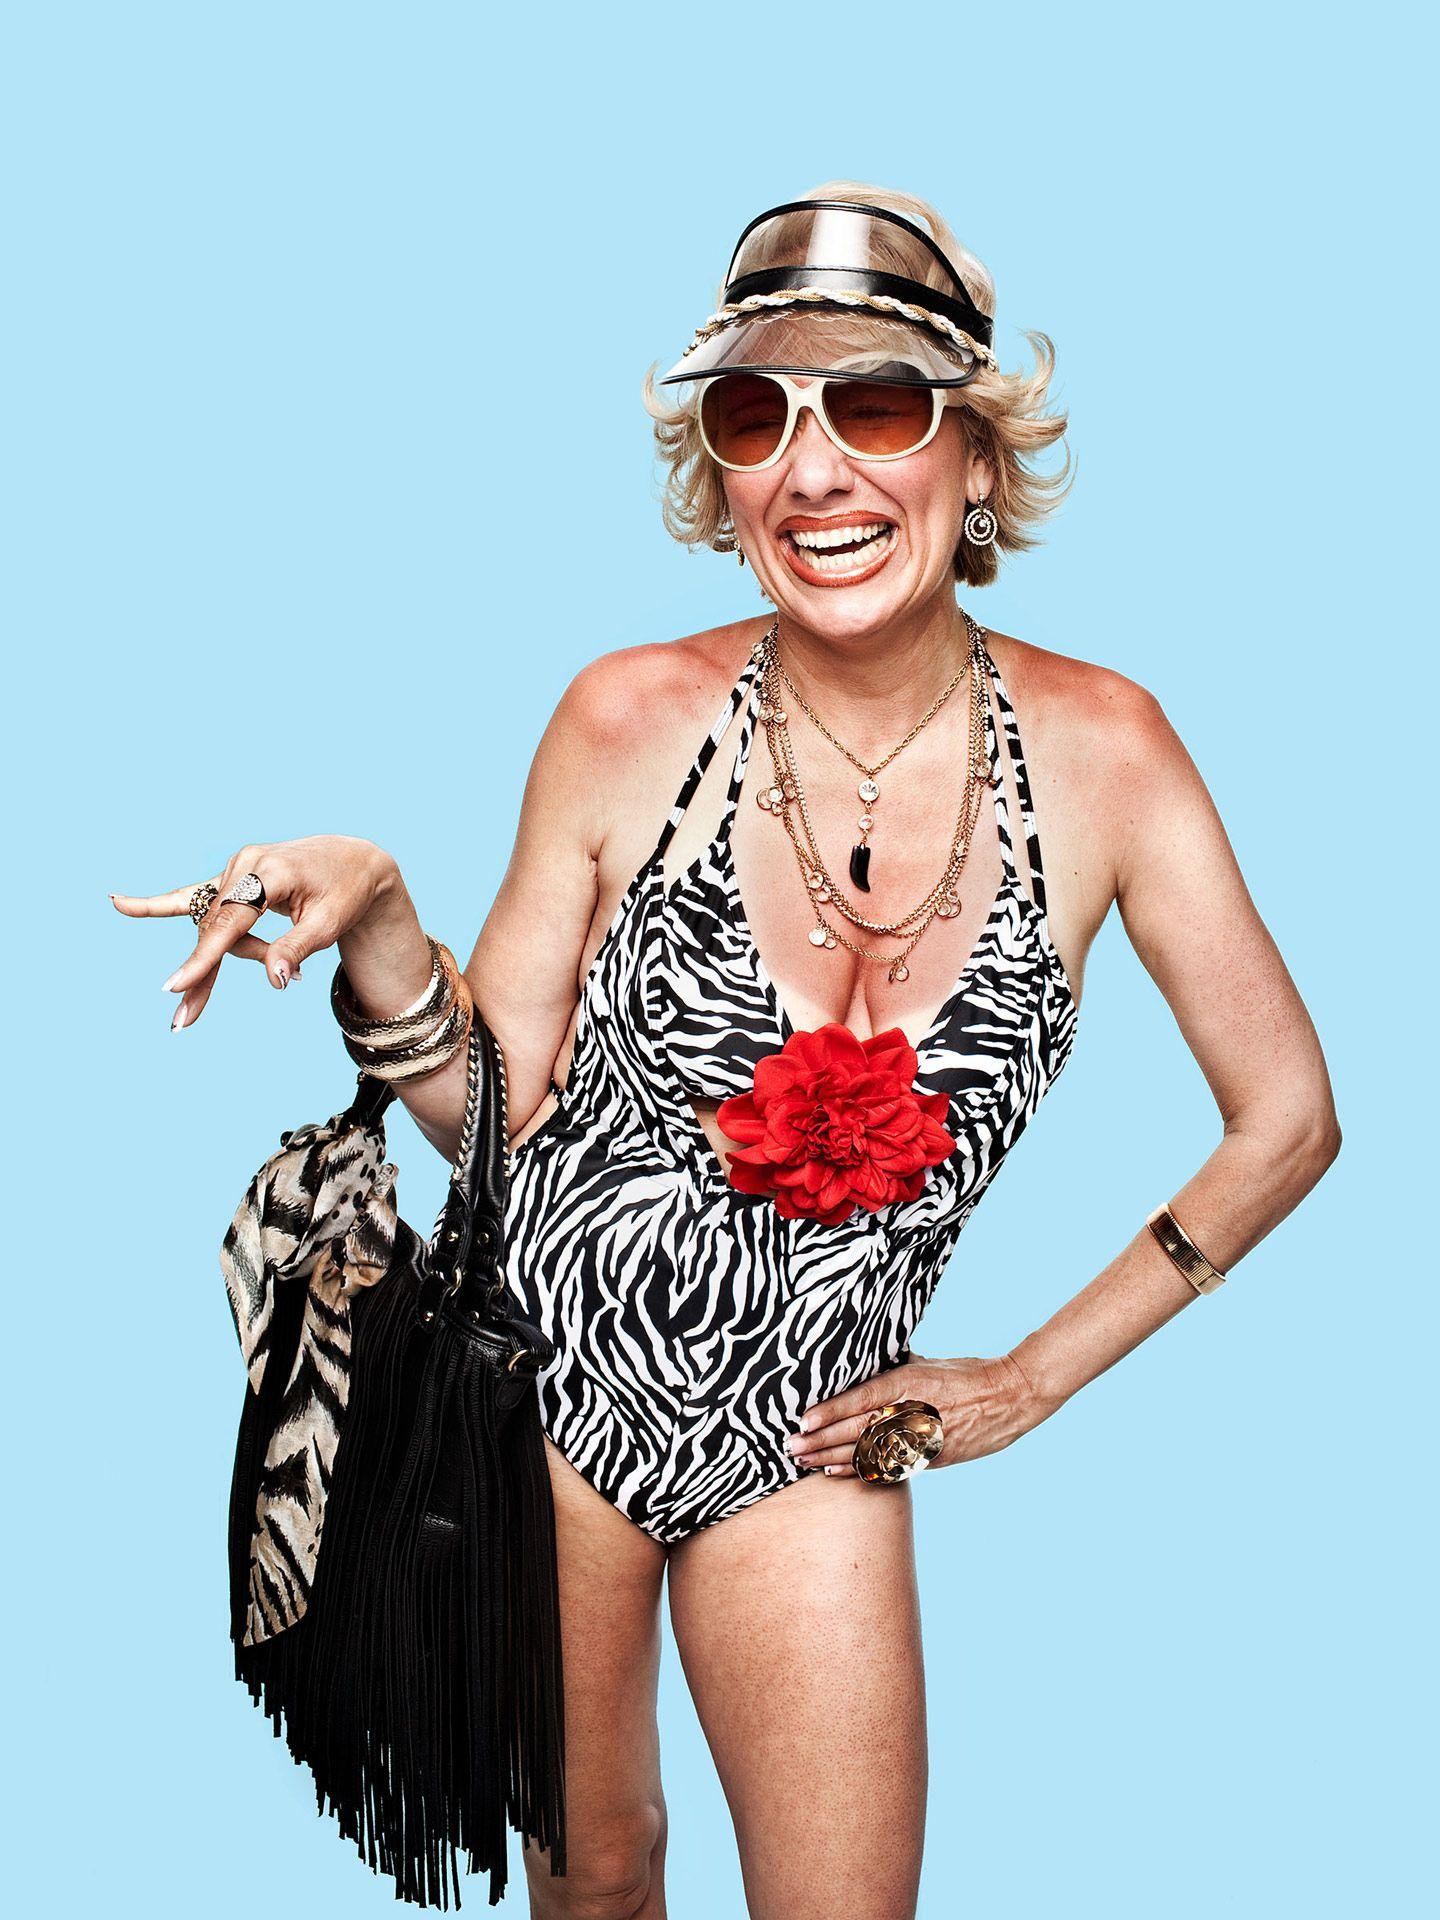 old woman in bathing suit for Educalcool campaign by Jocelyn Michel